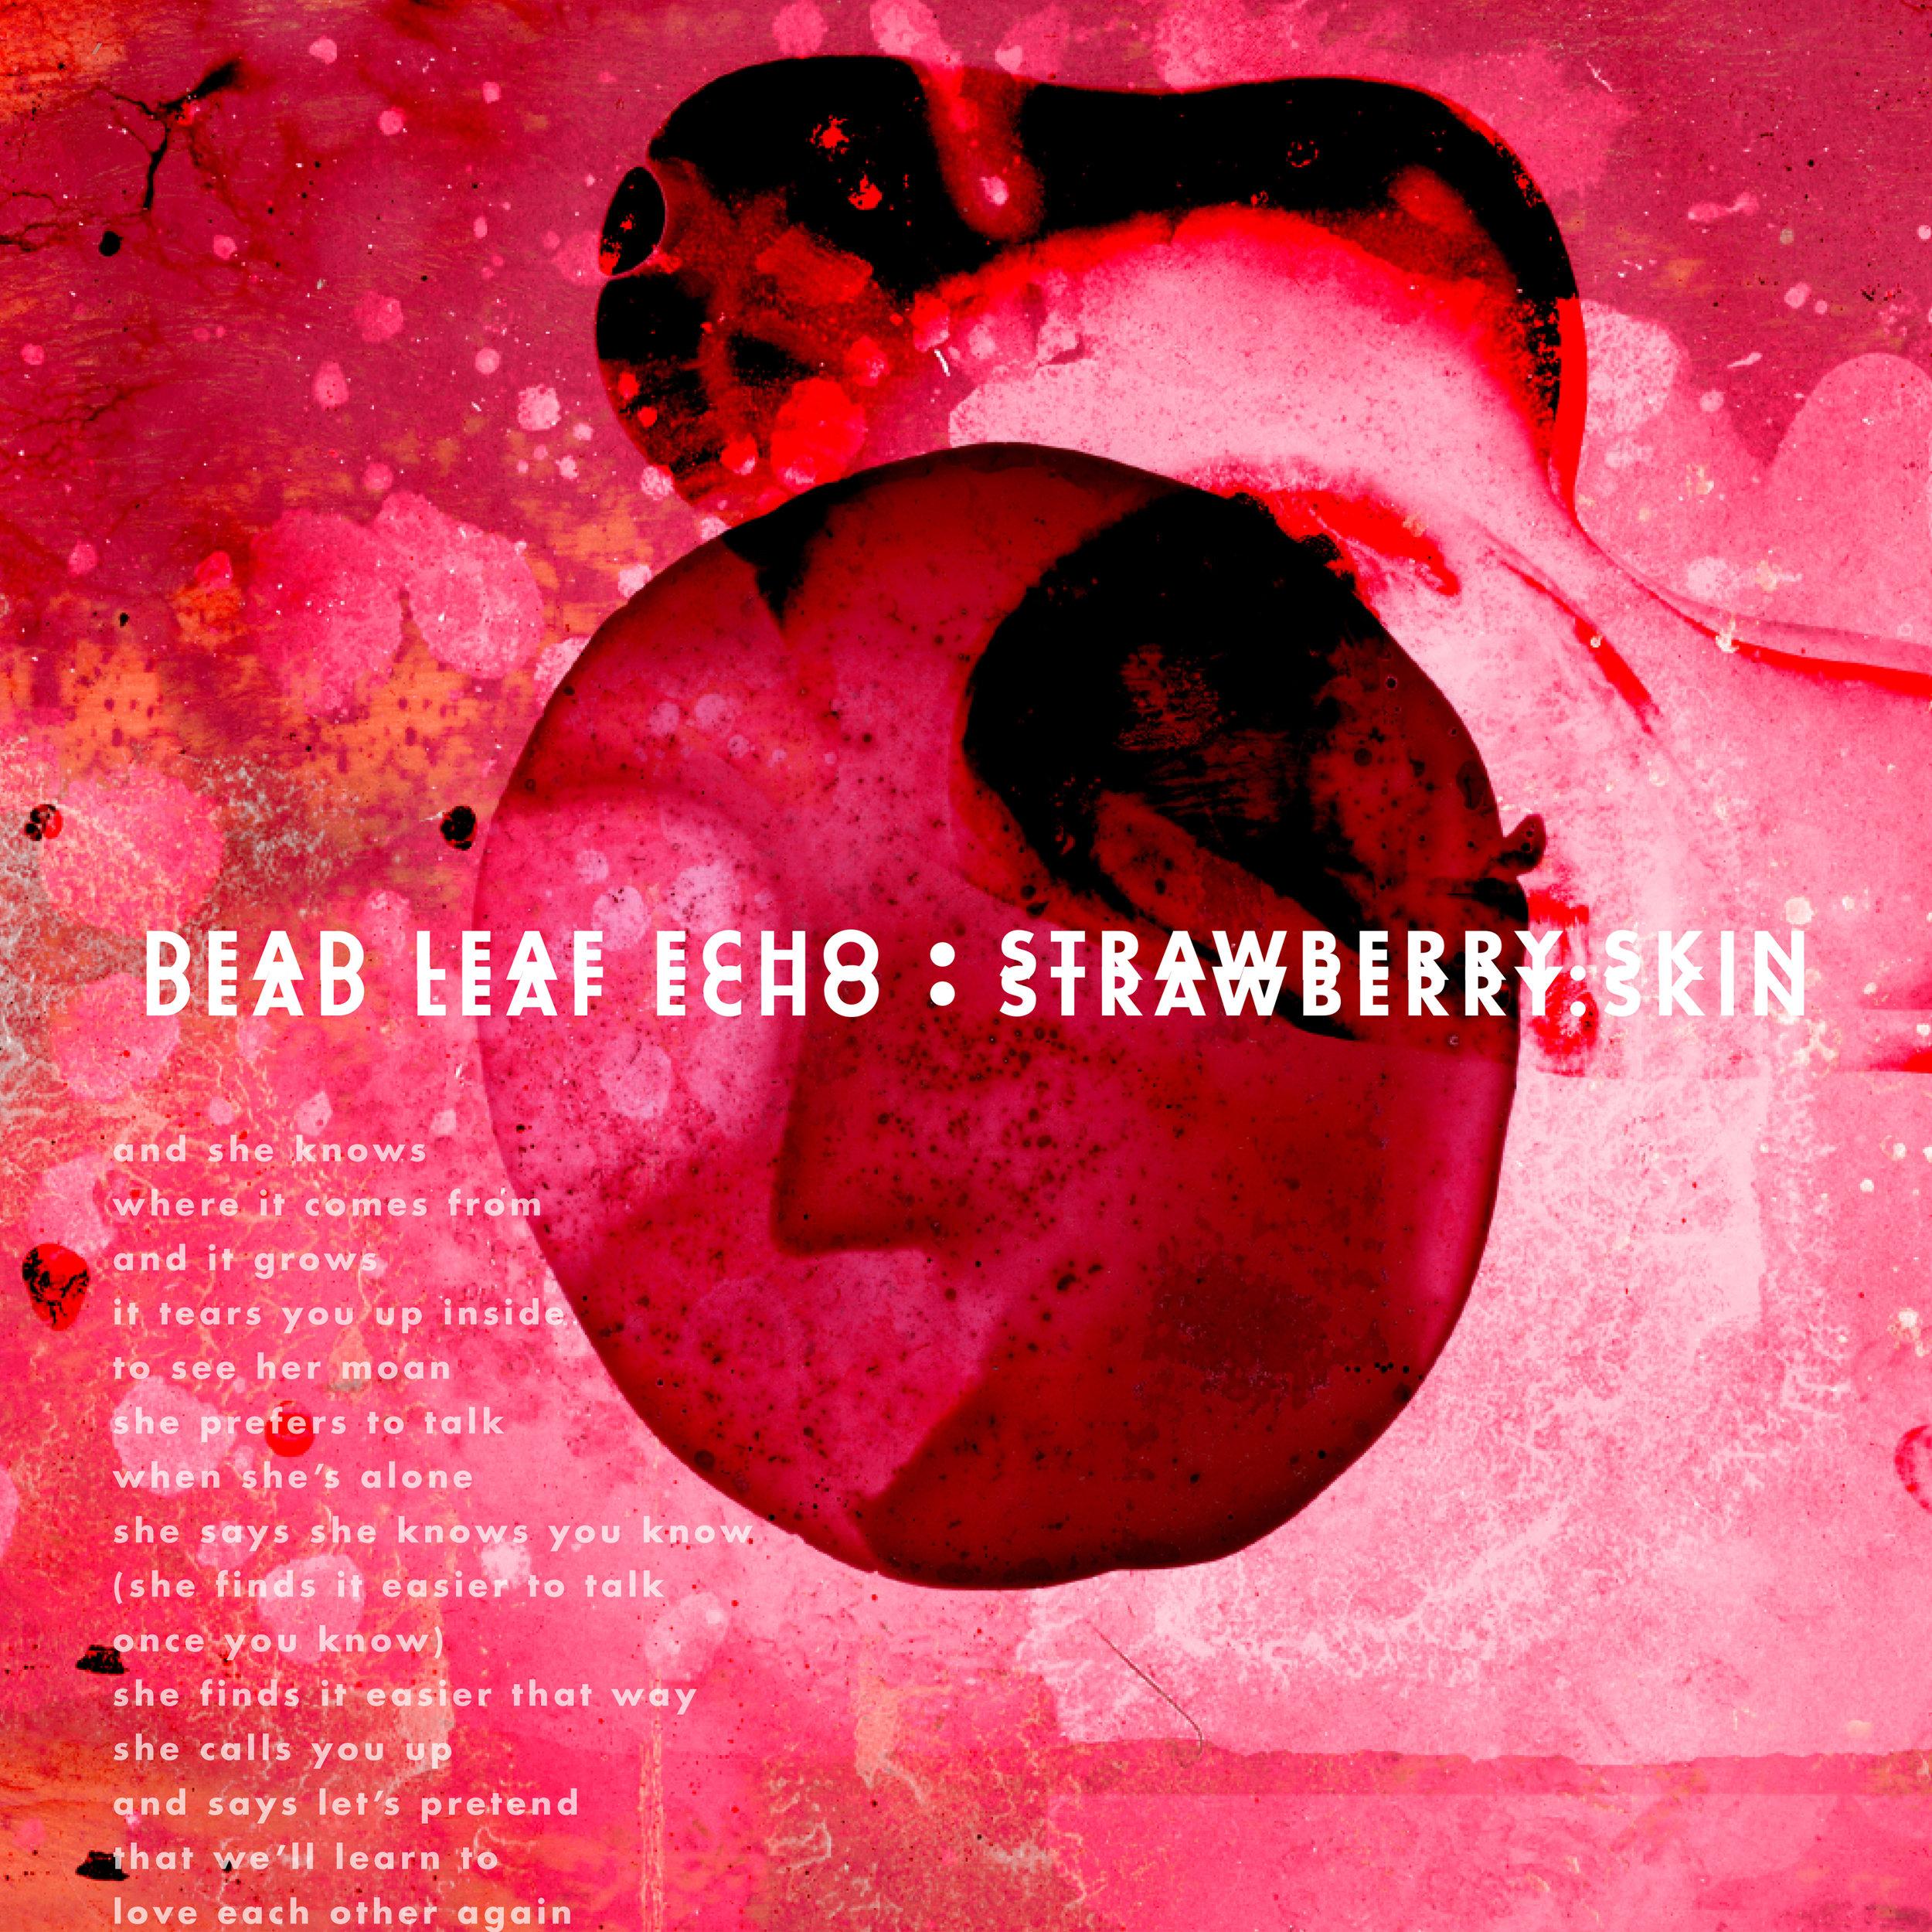 Strawberry_Skin_EP.jpg